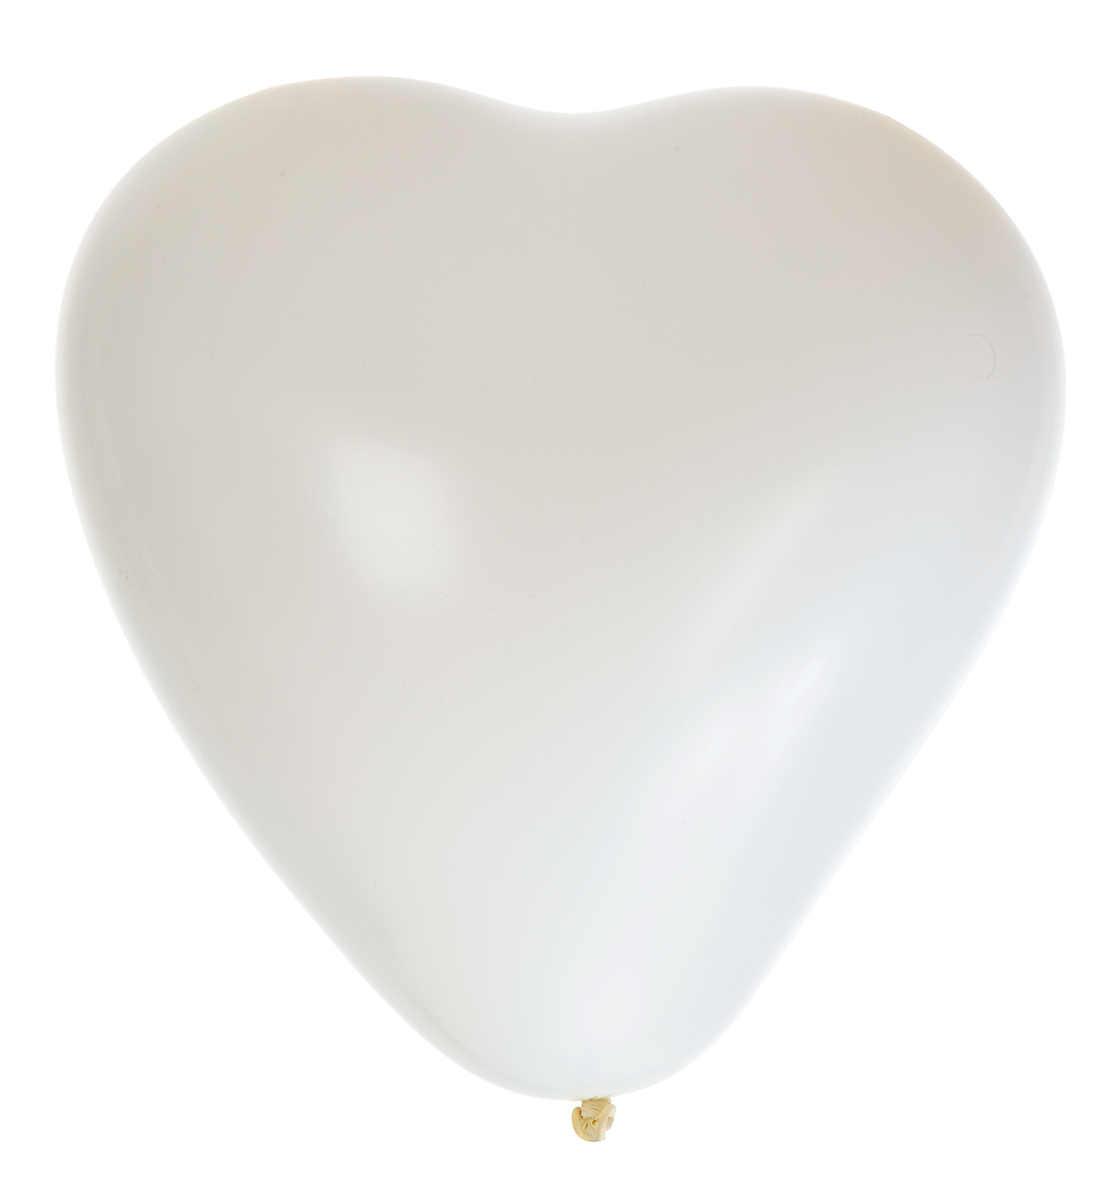 "Ballong 15"" vit hjärta 8-pack"